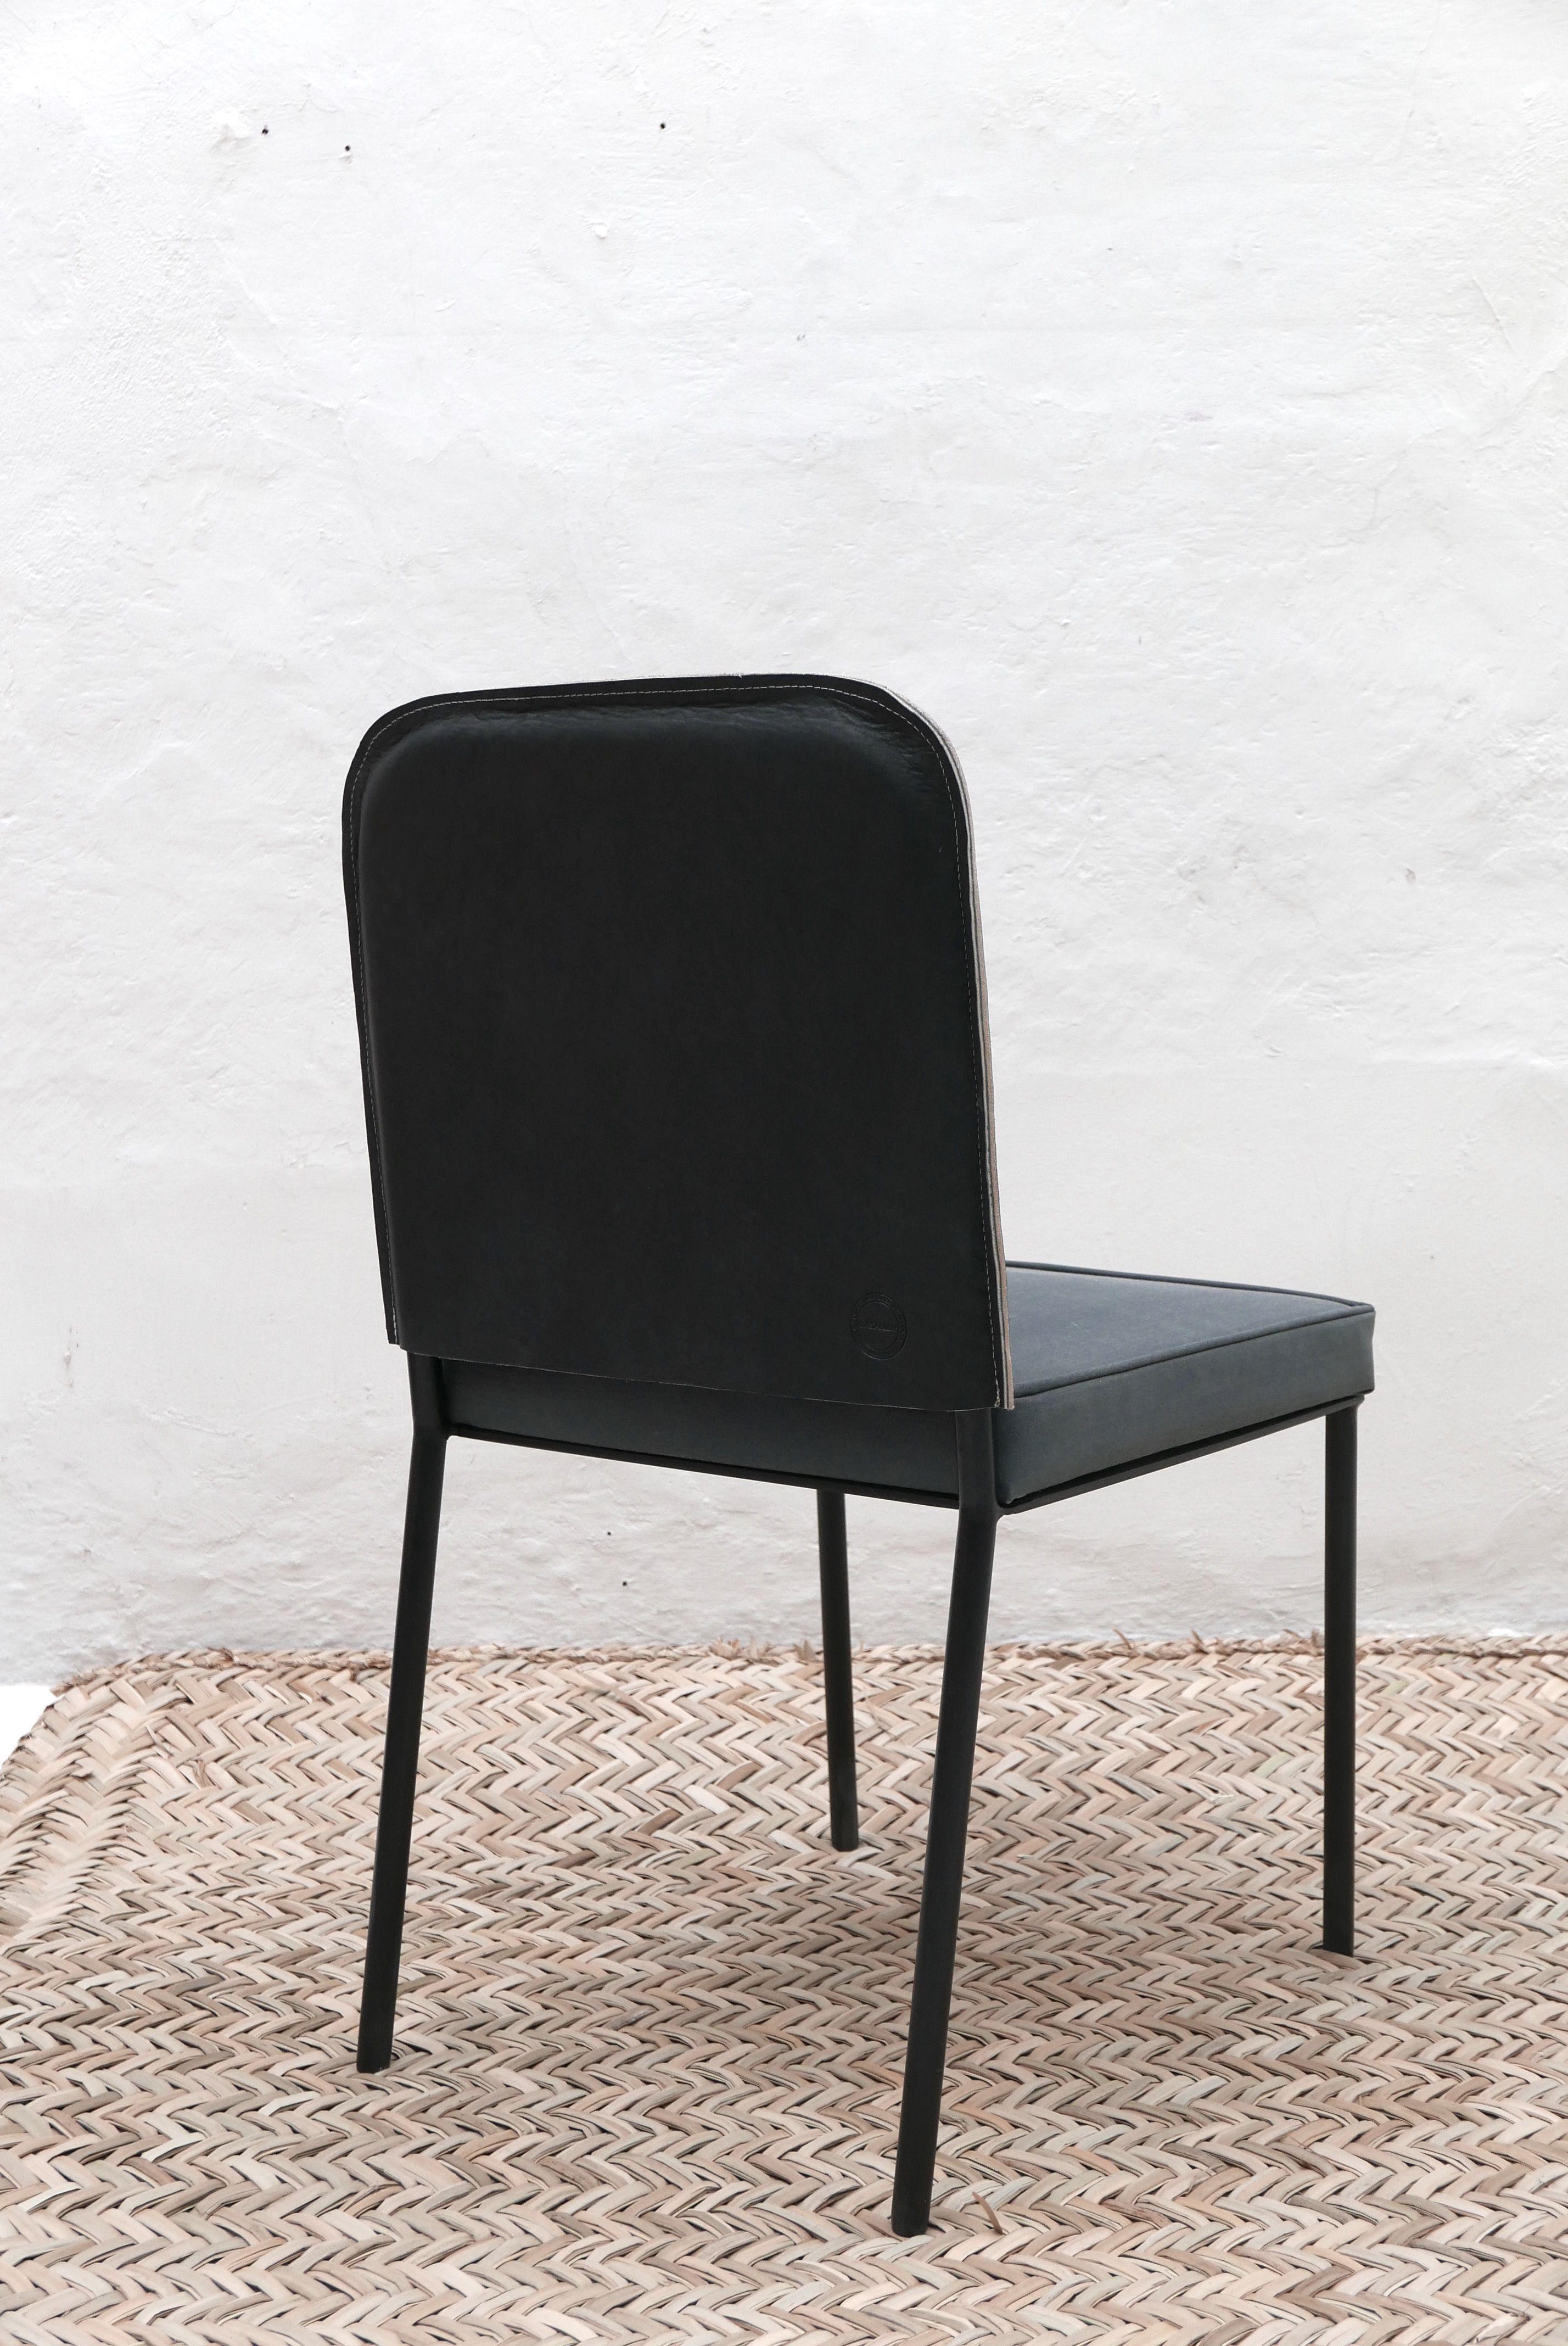 Ojai saddle leather side chair casamidyojai saddle leather side chair casamidy   STITCHED SADDLE LEATHER  . Tank Chair Pharrell Williams Price. Home Design Ideas